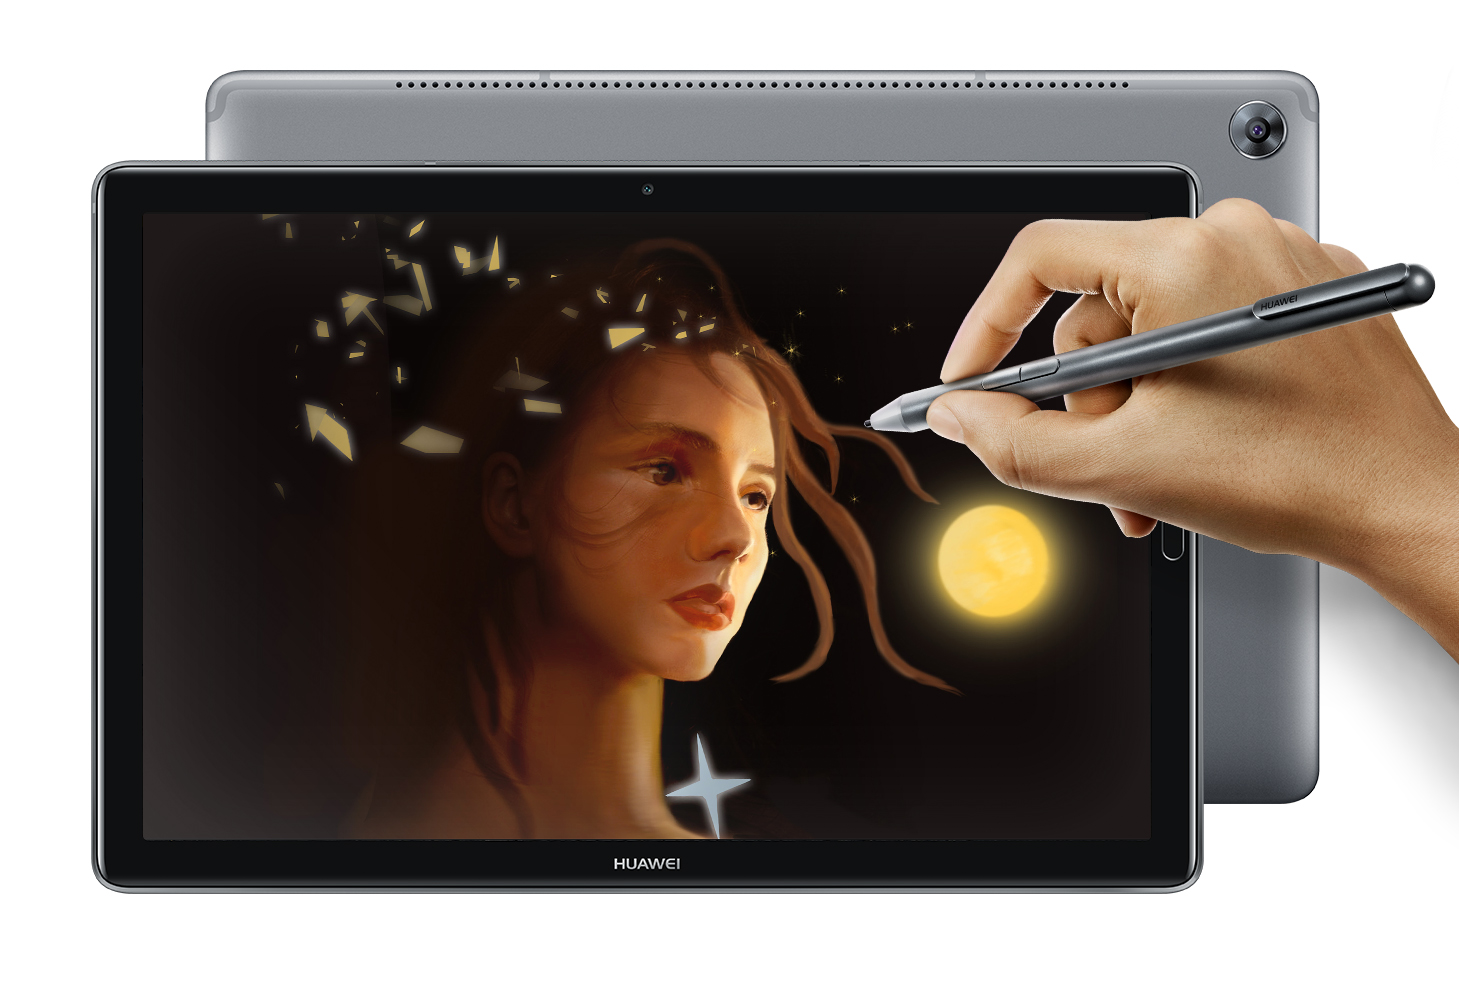 huawei mediapad m5 3 tablettes haut de gamme partir de 349 euros mwc 2018 frandroid. Black Bedroom Furniture Sets. Home Design Ideas